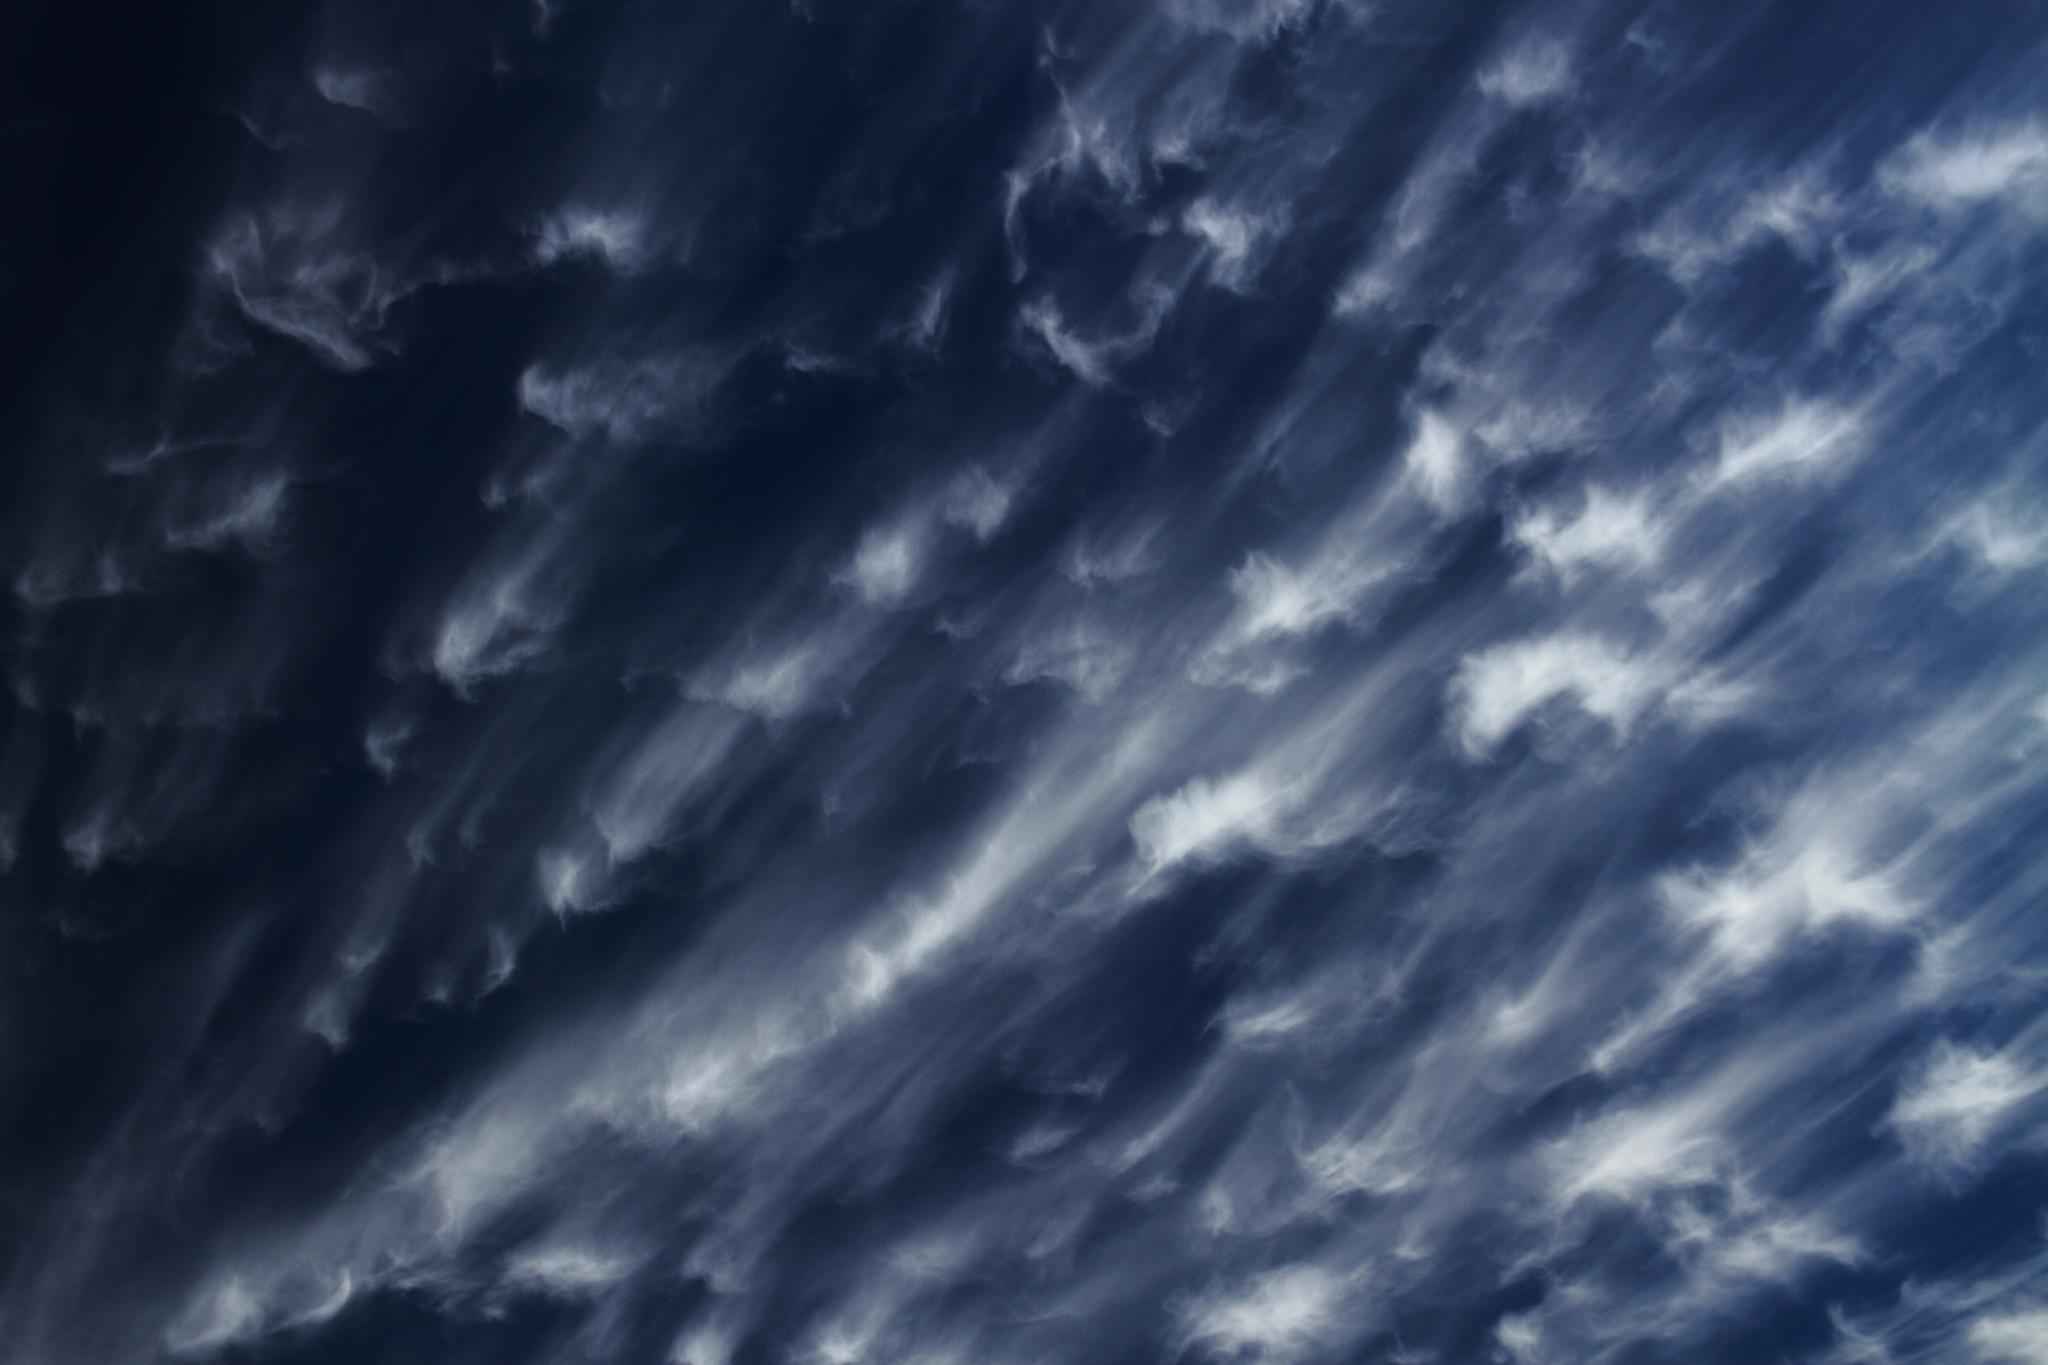 Clouds by Marcin Chmielecki